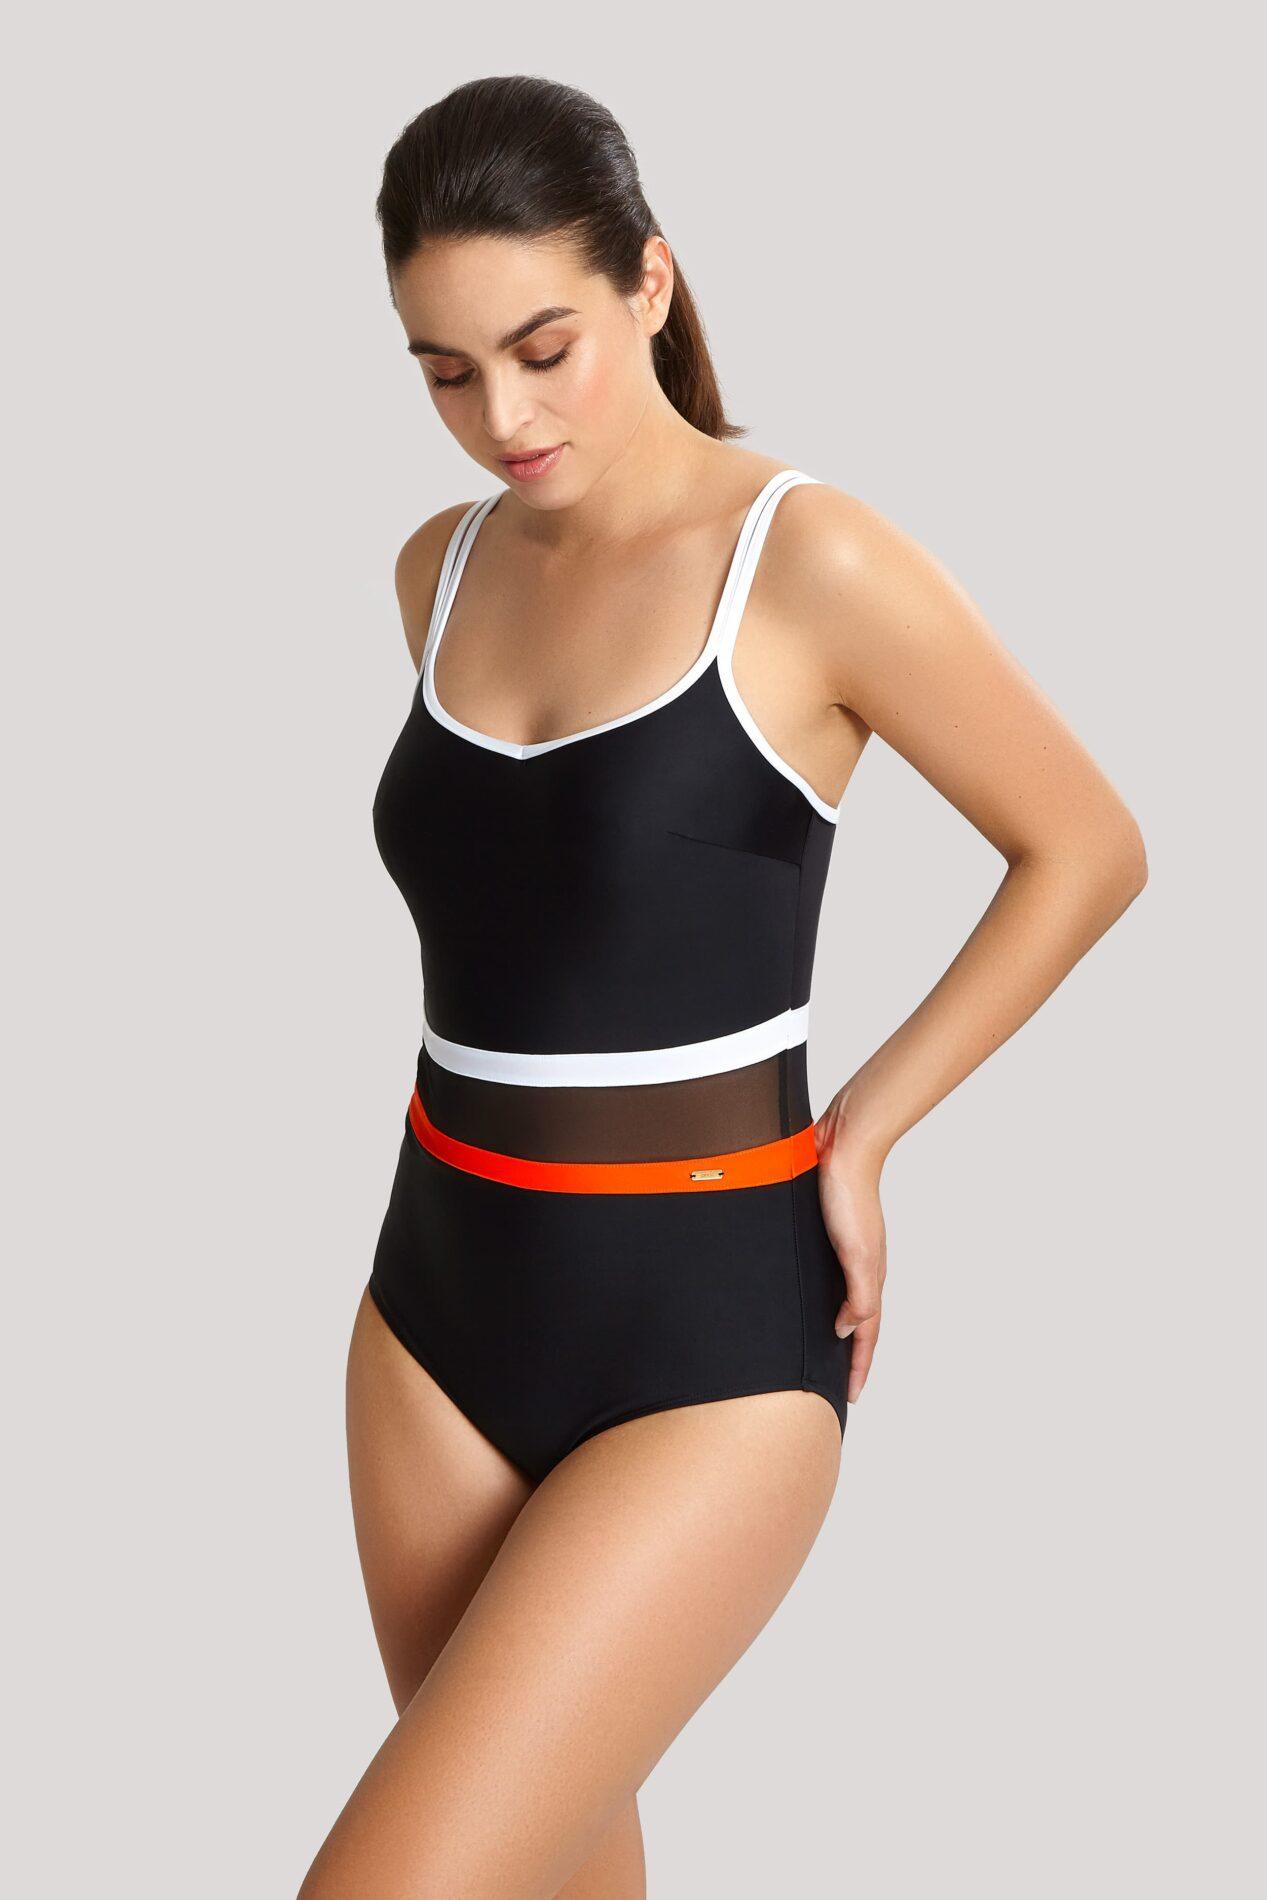 Купальники SW1380_879_1 Kira Balconnet Swimsuit Black Orange T F 1-min